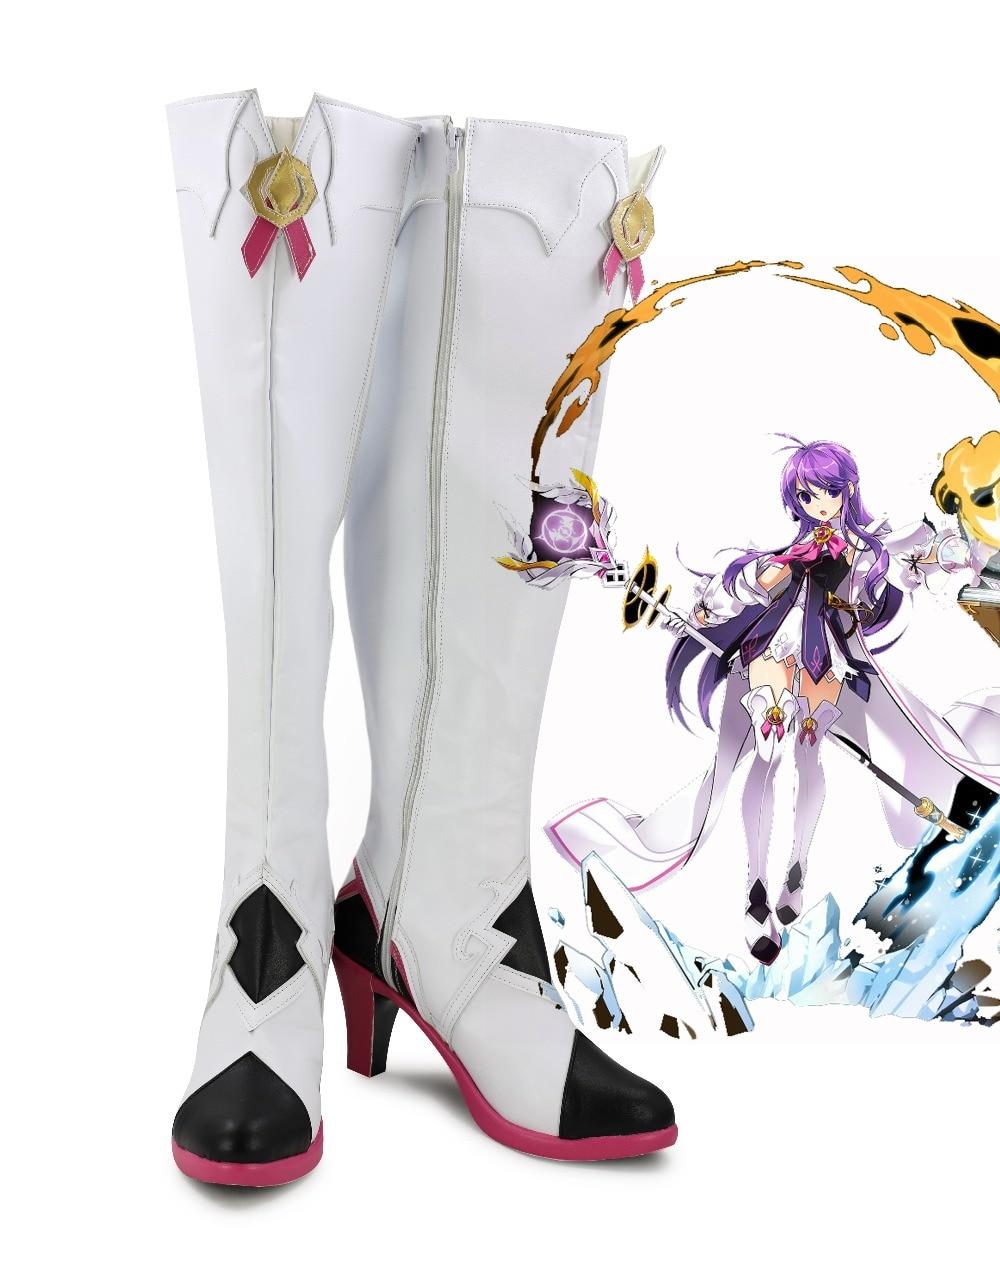 Elsword amor ao vivo magia meninas ur sakurauchi riko lolita punk cosplay botas de fantasia sapatos